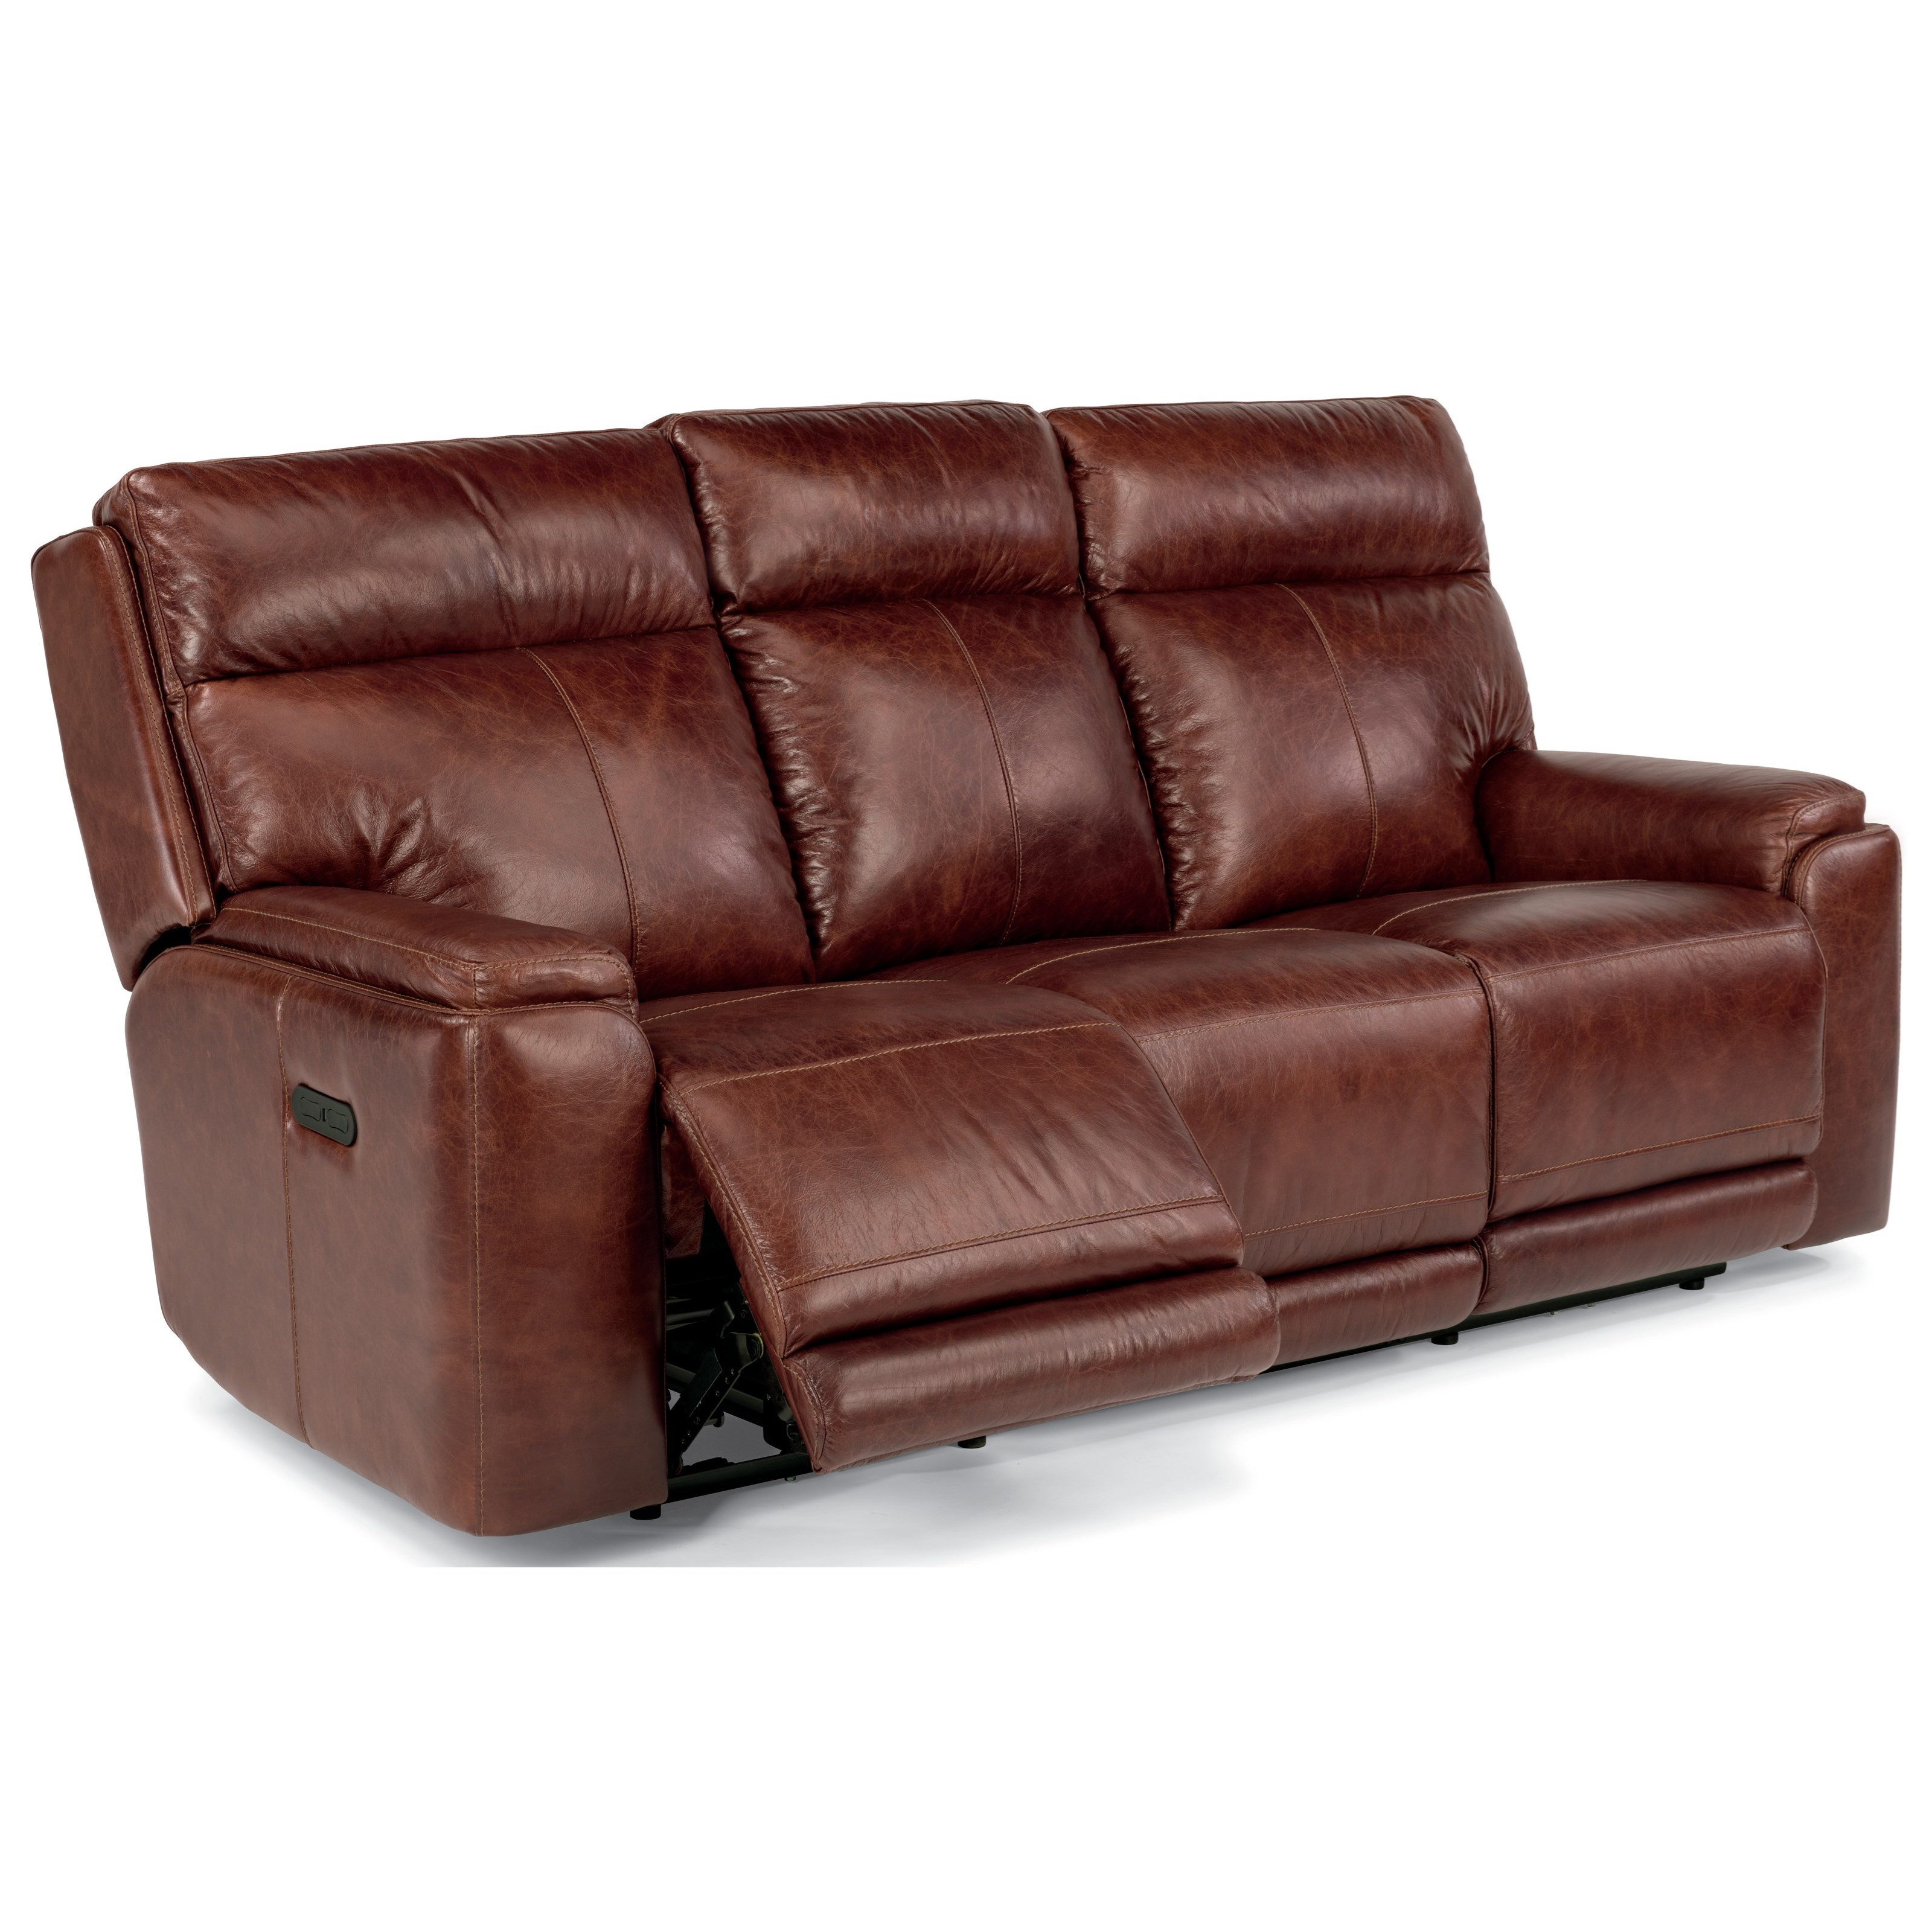 Flexsteel latitudes sienna 1675 62ph power reclining sofa with adjustable headrests and usb - Sofa reclinable ...